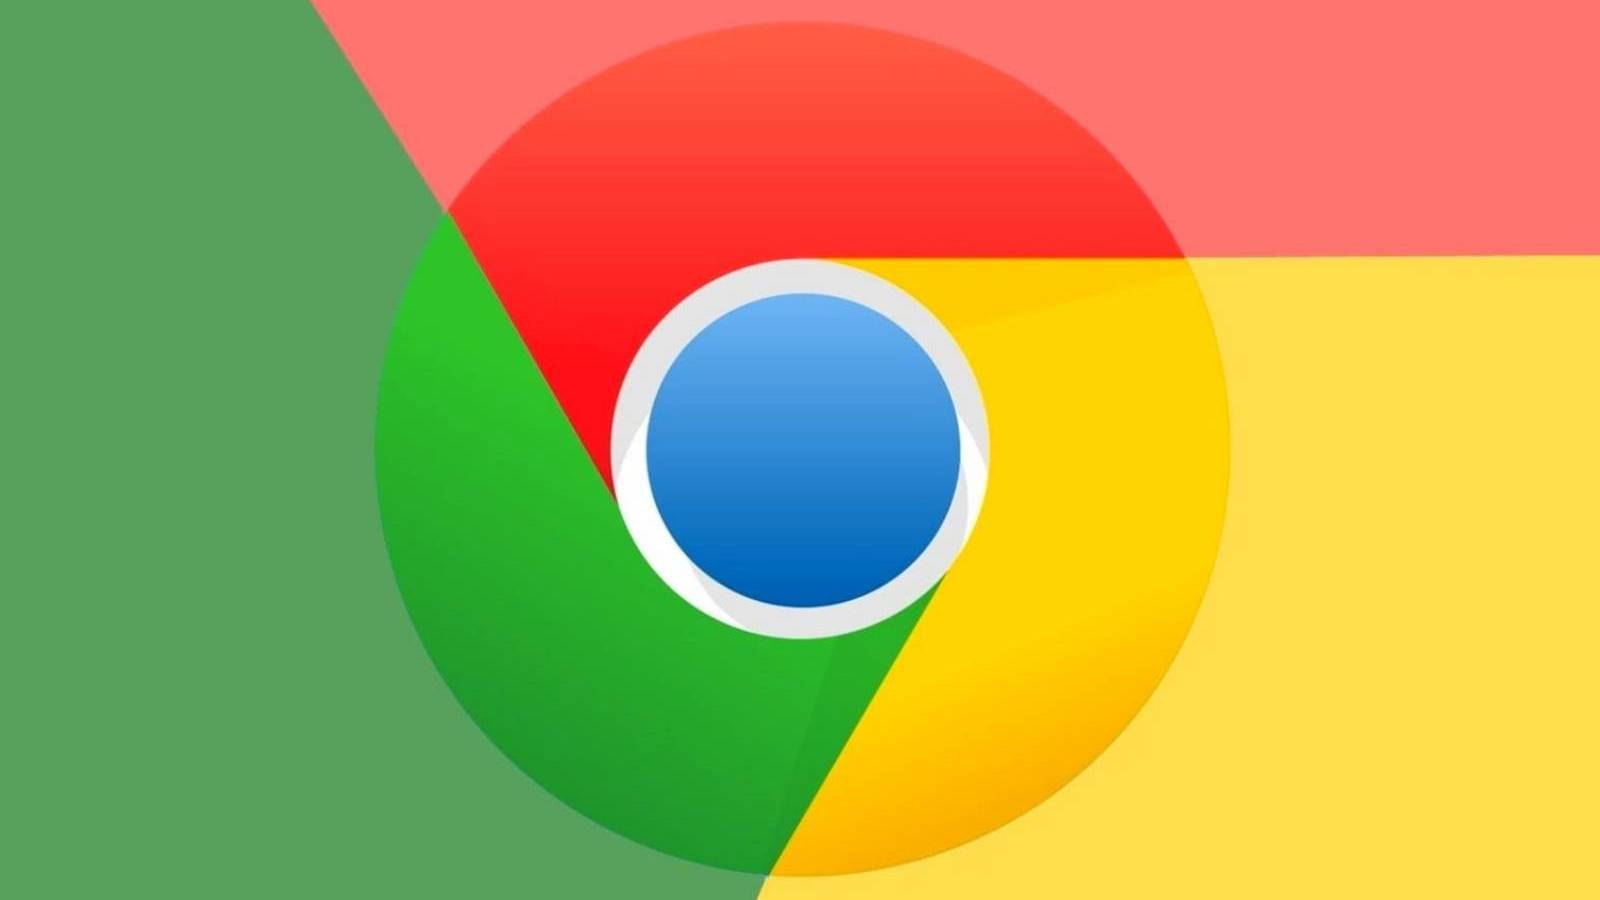 Google Chrome Actualizare Noutati Importante Lansata